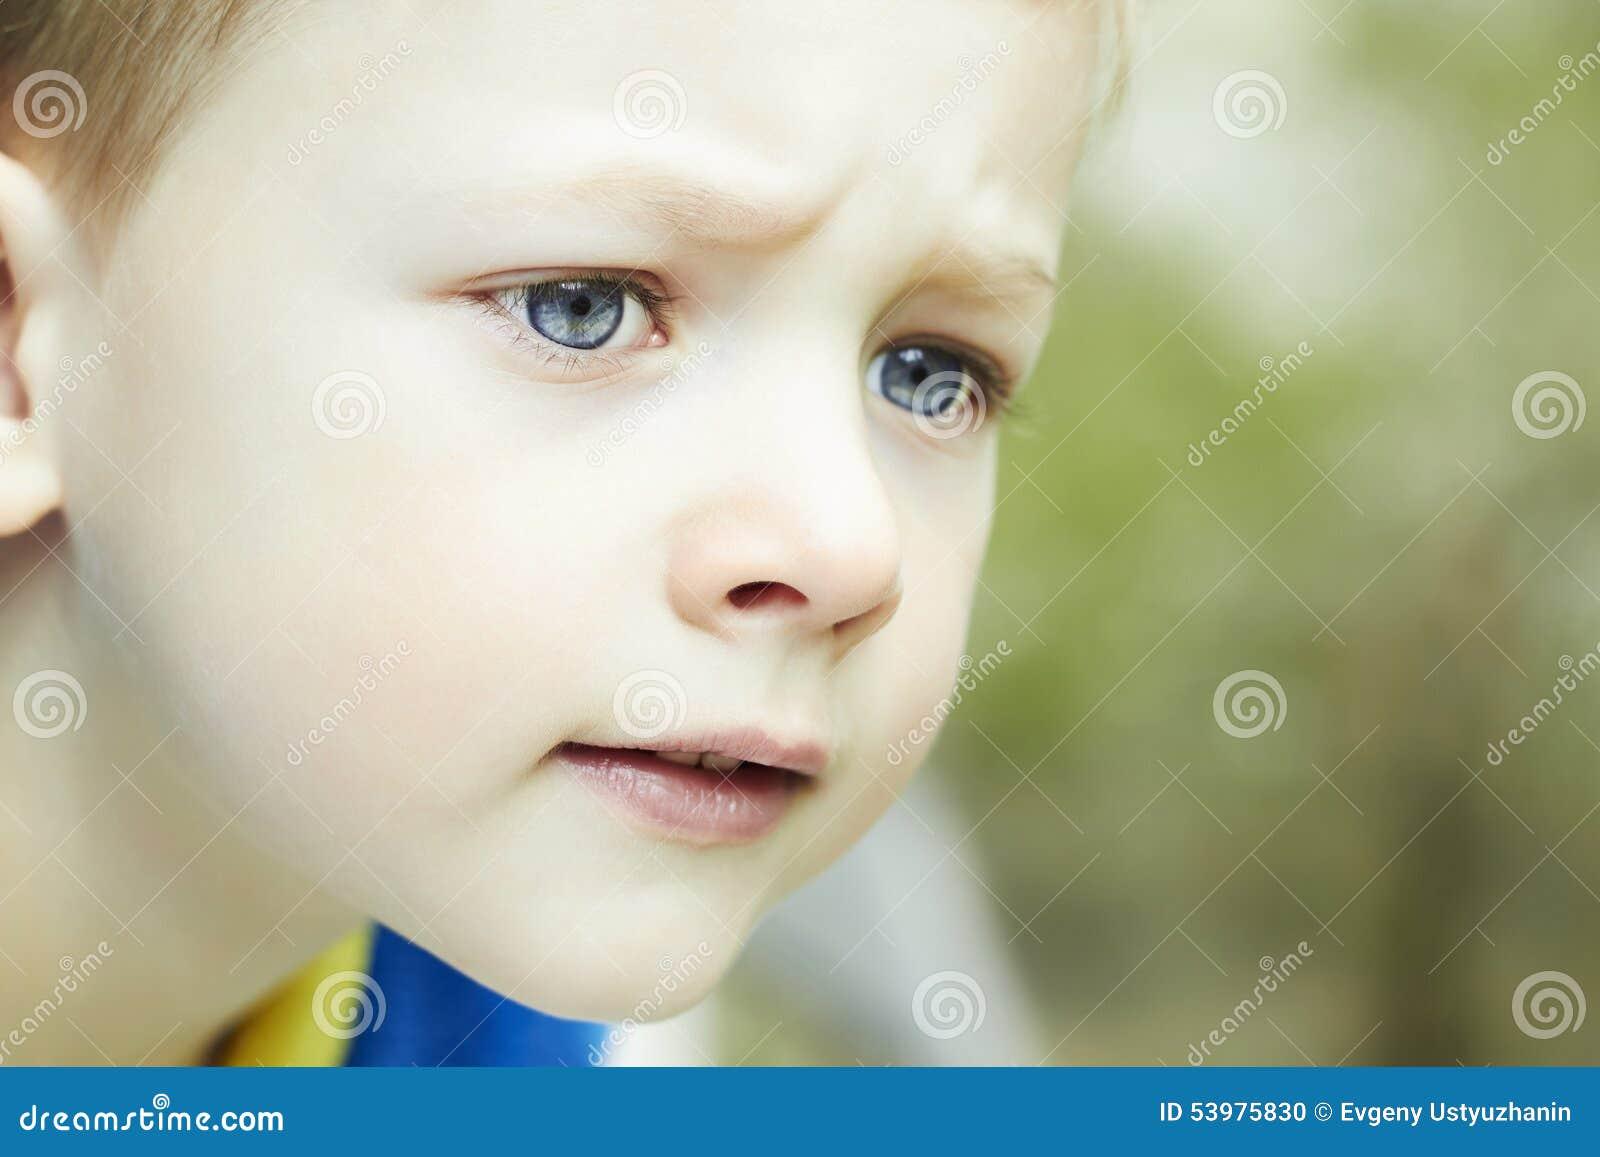 27bada19e4 Αστείο νέο ευτυχές αγόρι πρόσωπο του παιδιού Στοκ Εικόνες - εικόνα ...